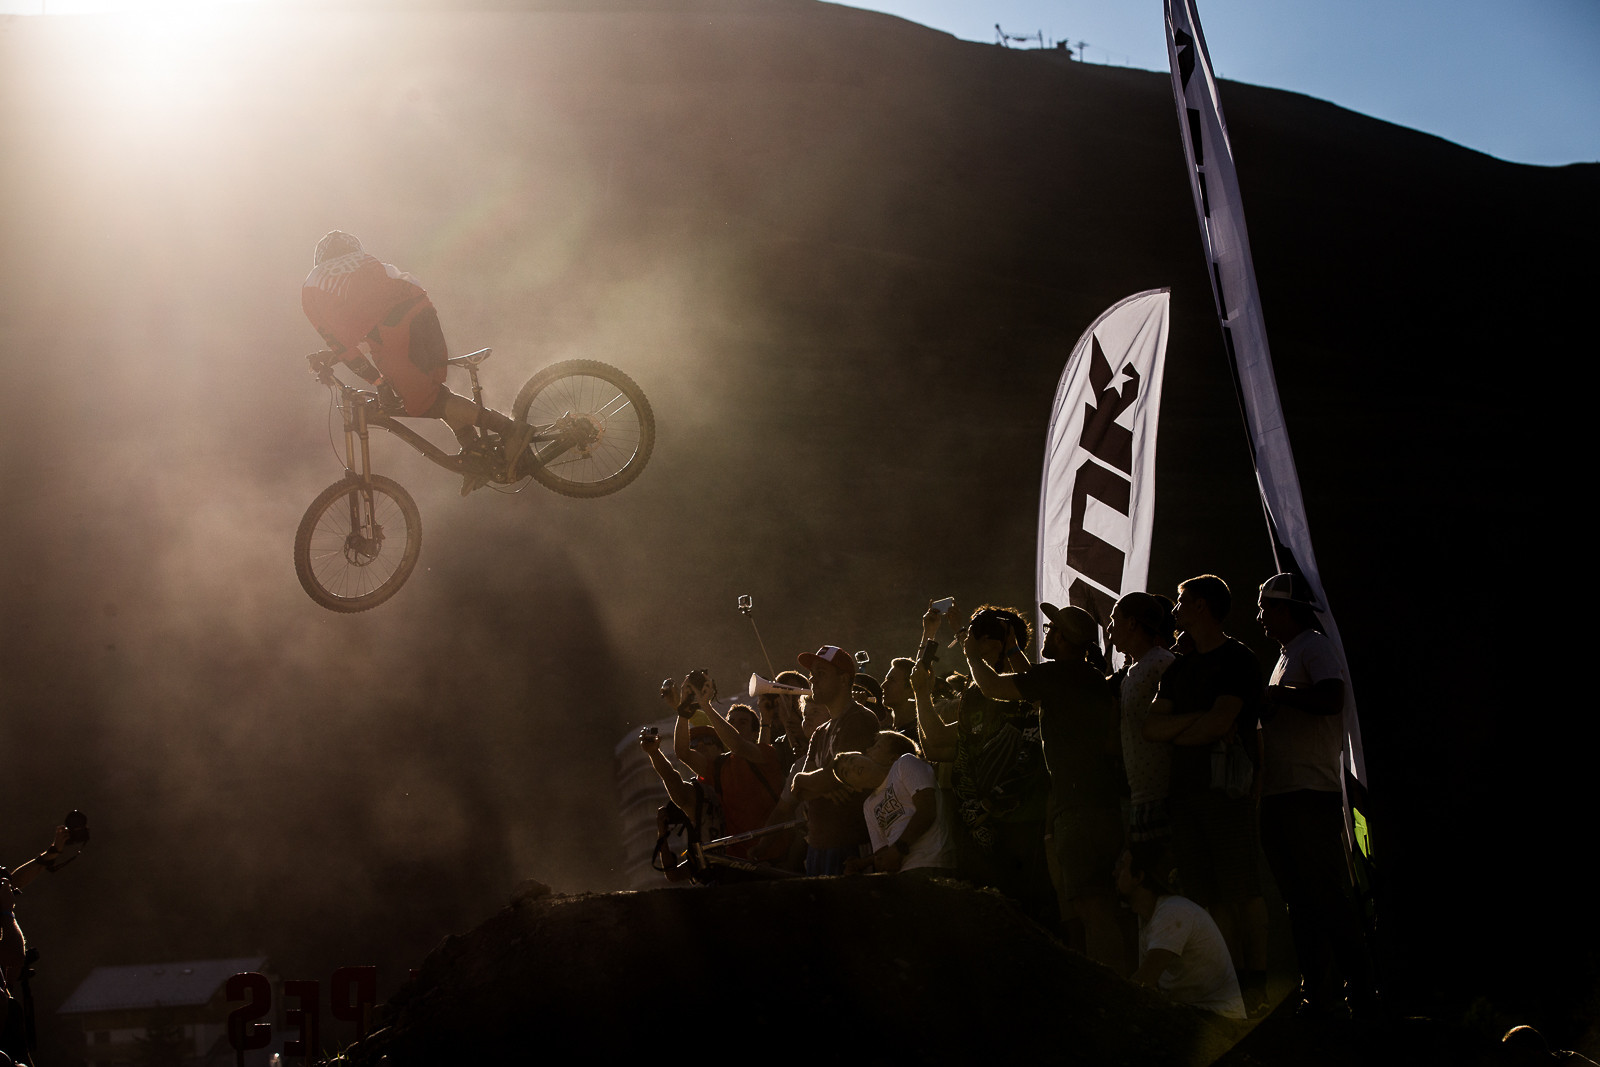 Kapow! Whip Off European Champs, Crankworx L2A - Whip Off European Champs, Crankworx L2A - Mountain Biking Pictures - Vital MTB